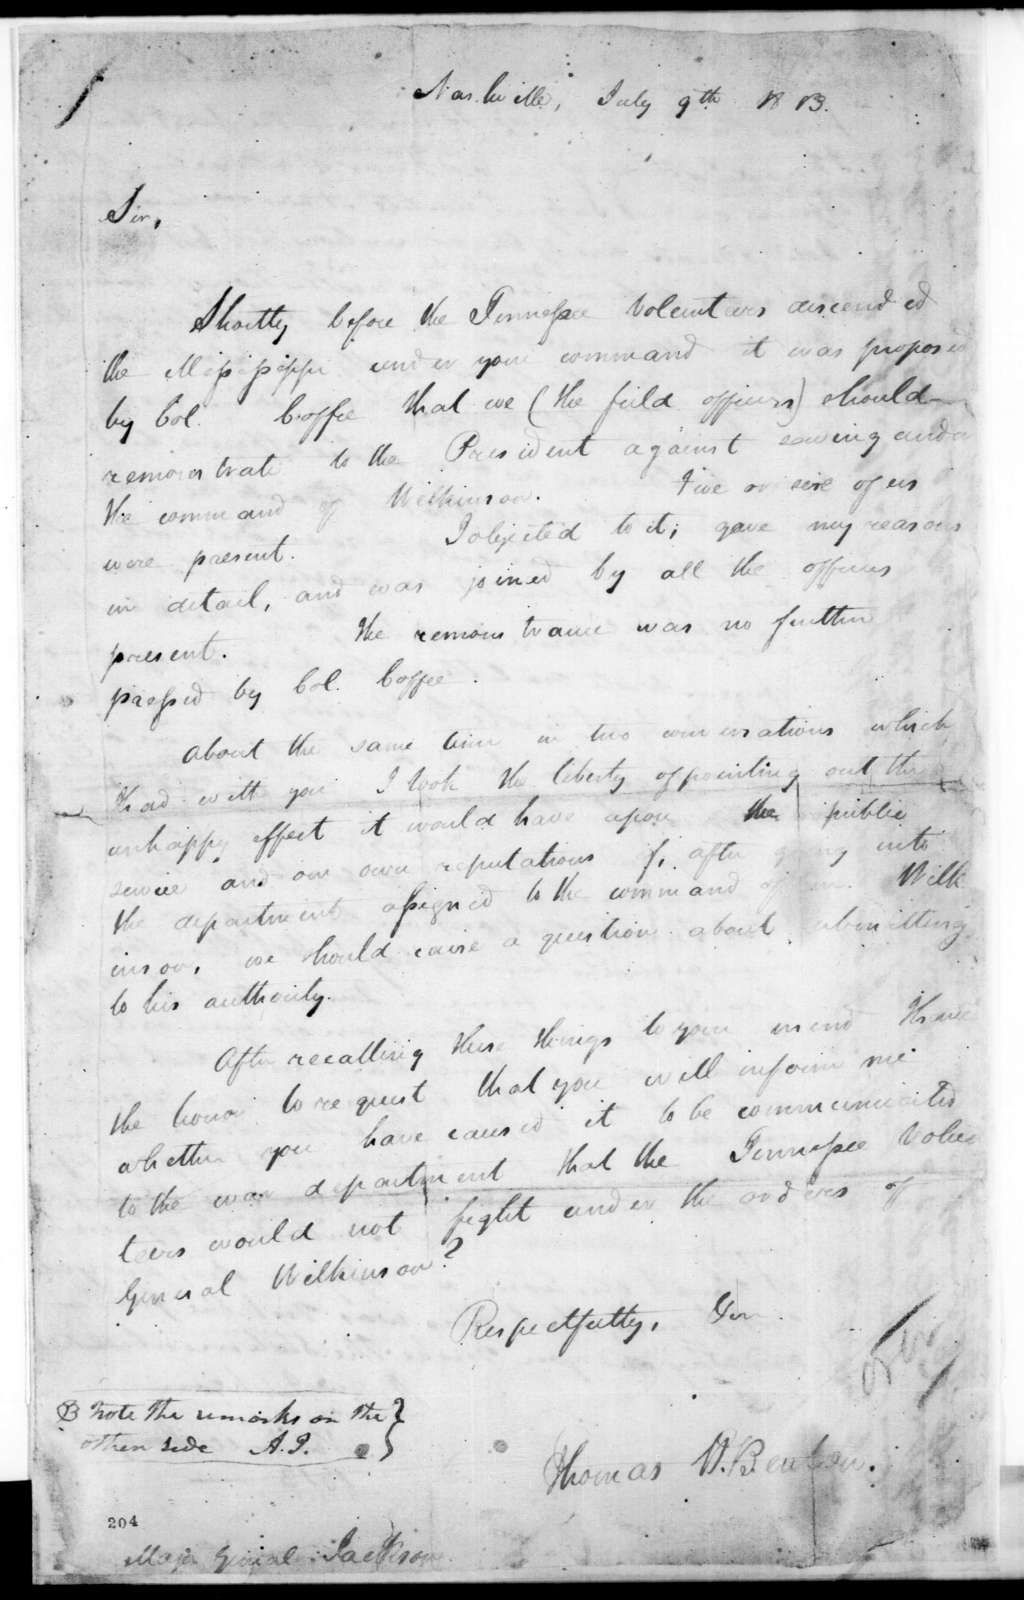 Thomas Hart Benton to Andrew Jackson, July 9, 1813